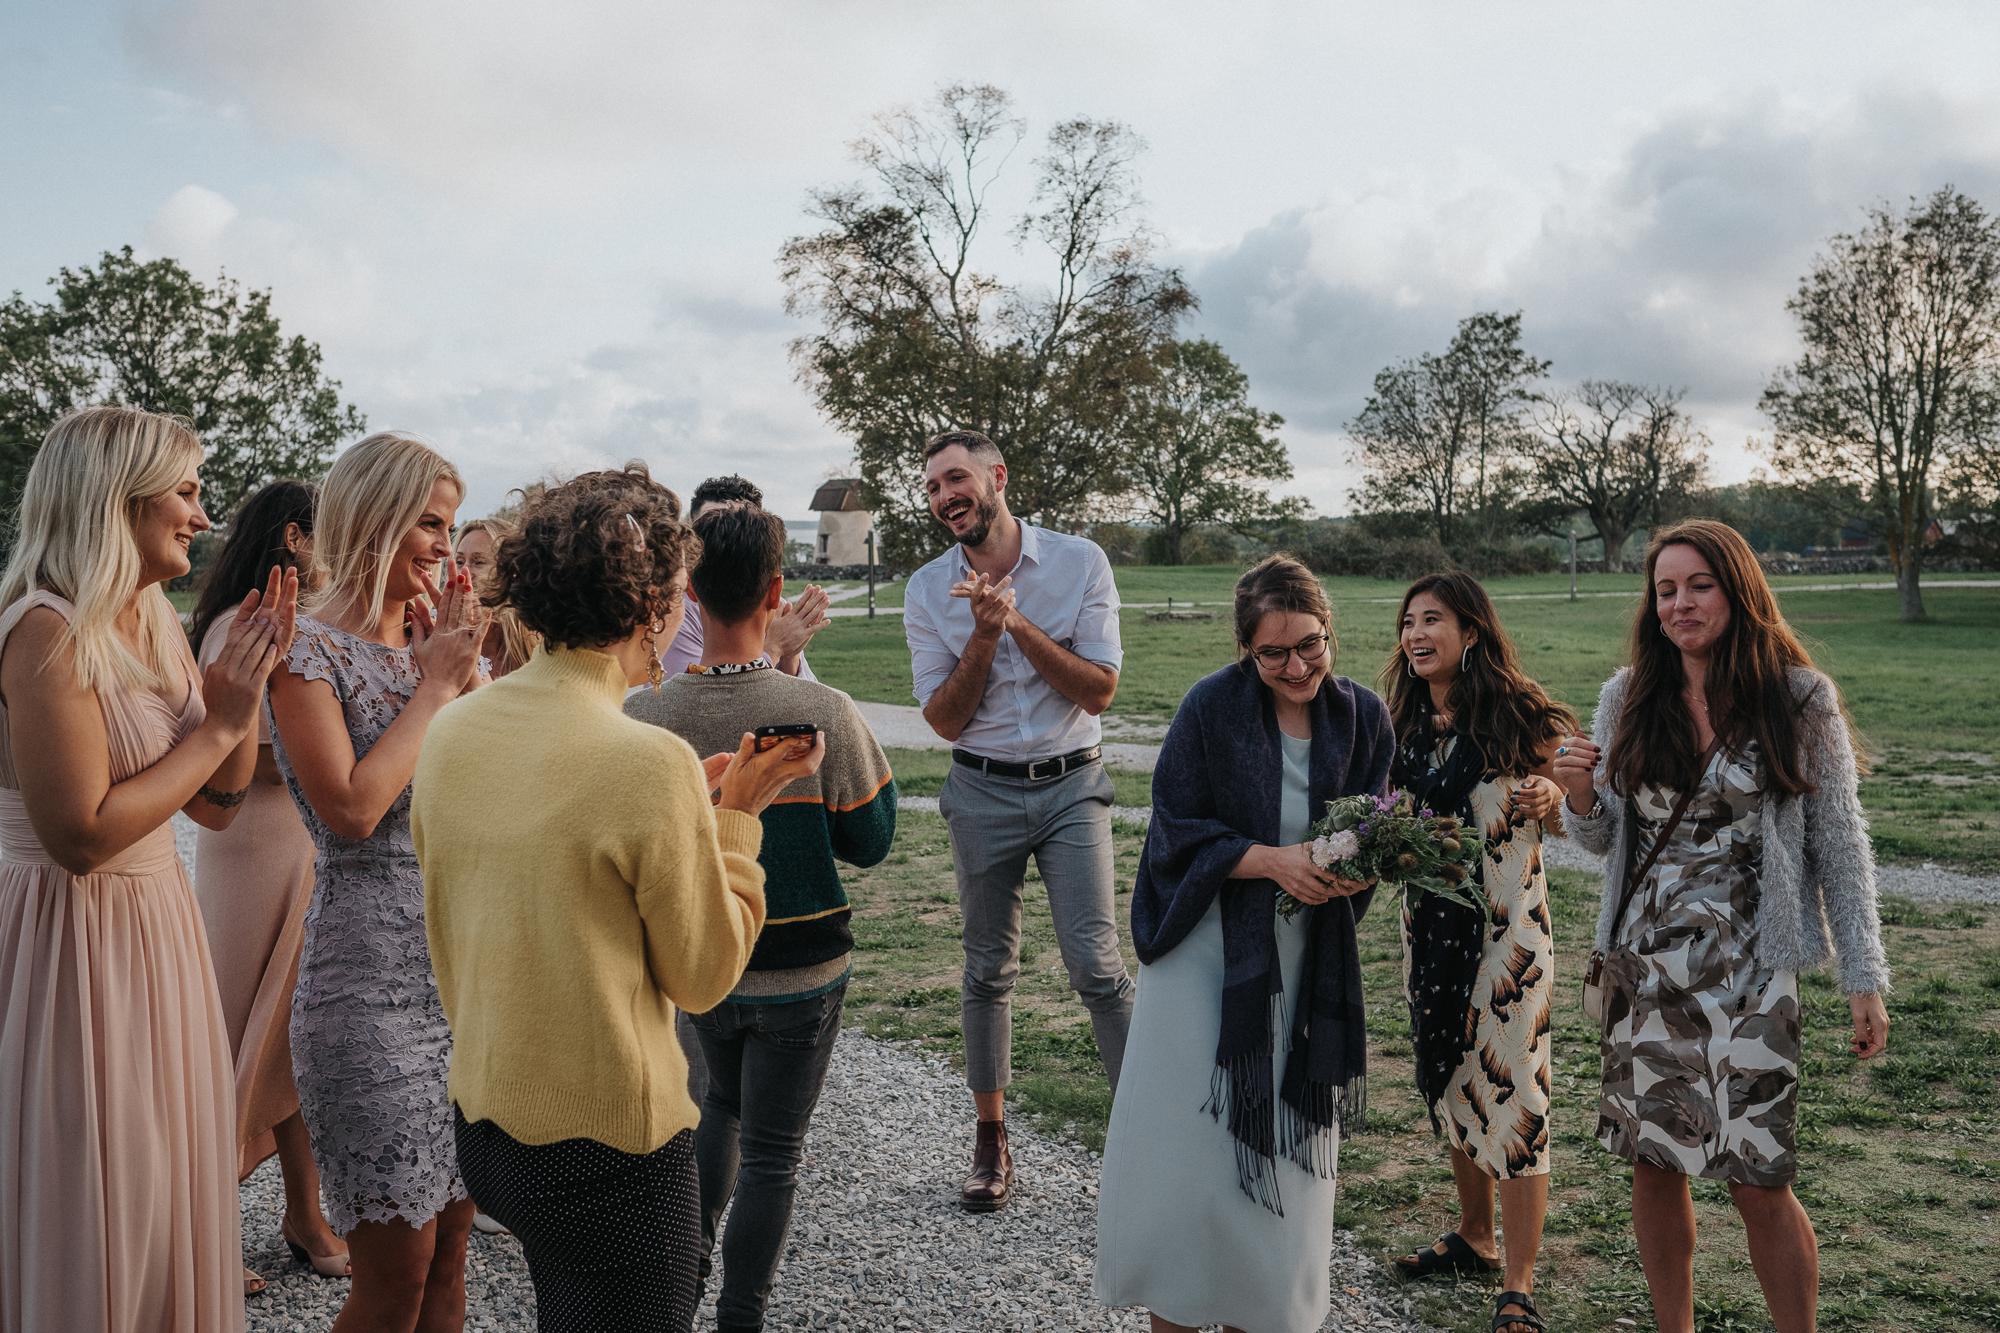 067-bröllop-gåsemora-gårdskrog-neas-fotografi.jpg